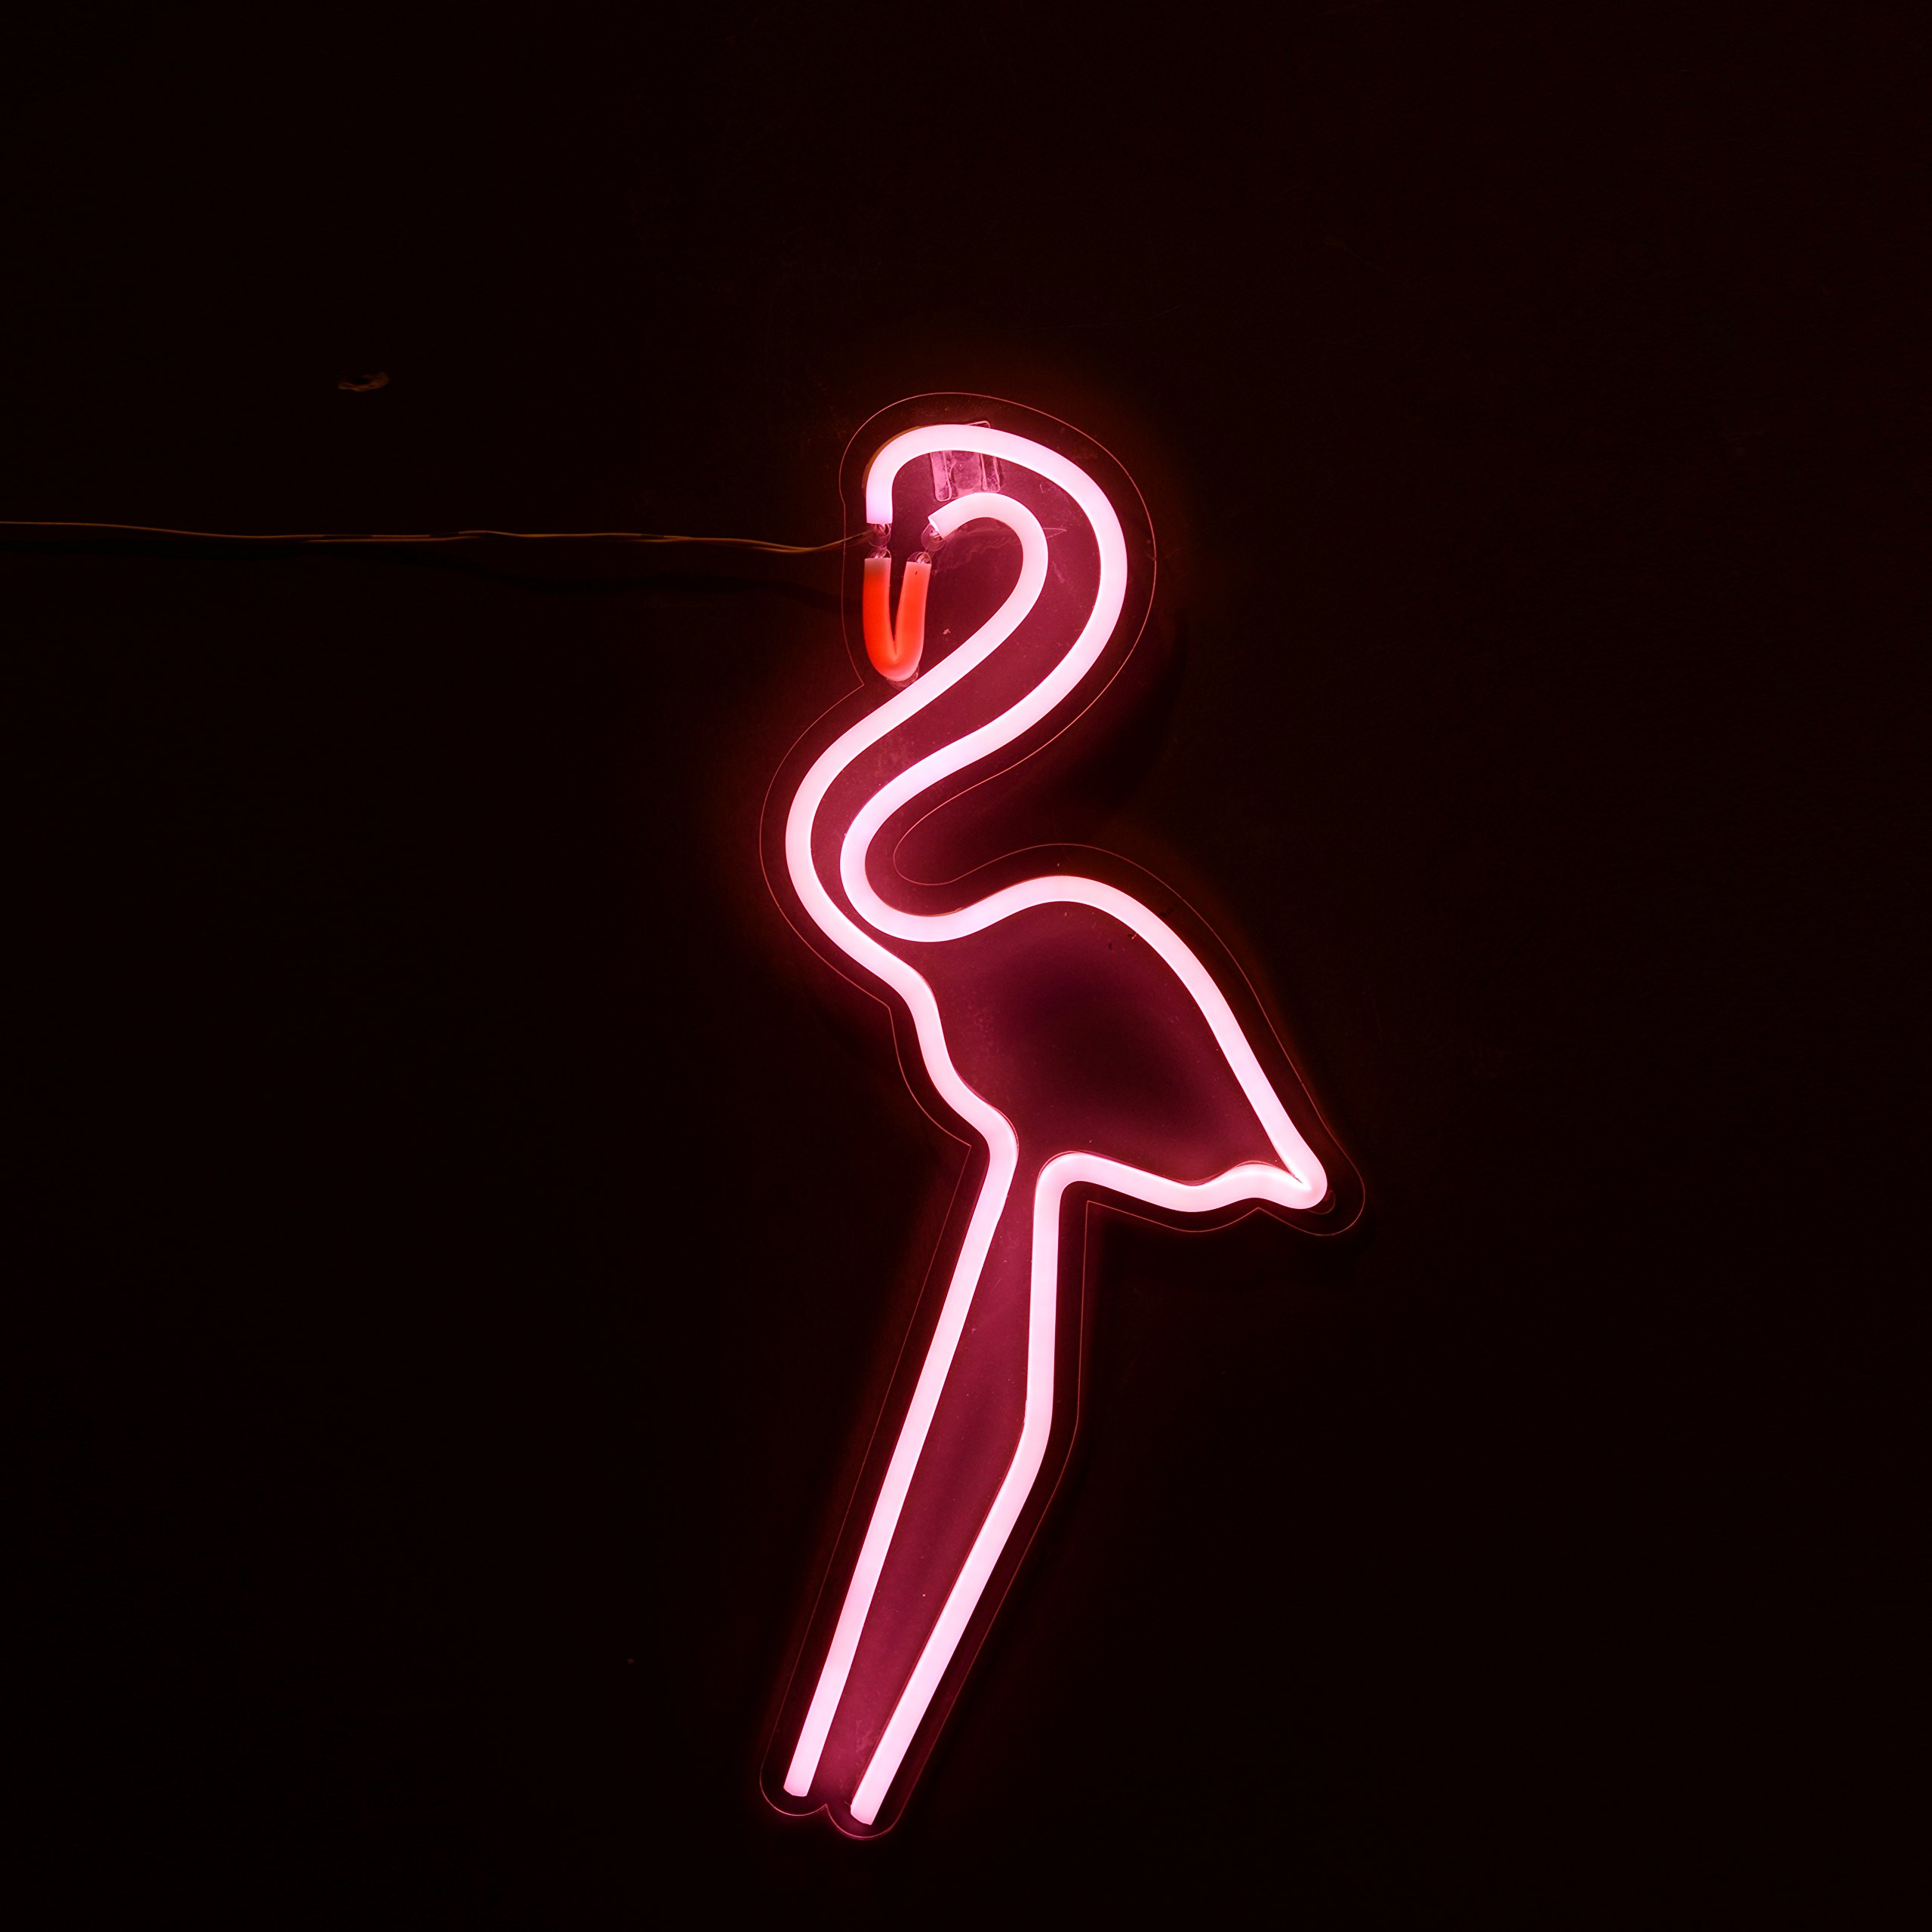 NIKKY HOME NL17001P Flamingo Neon Light, Pink